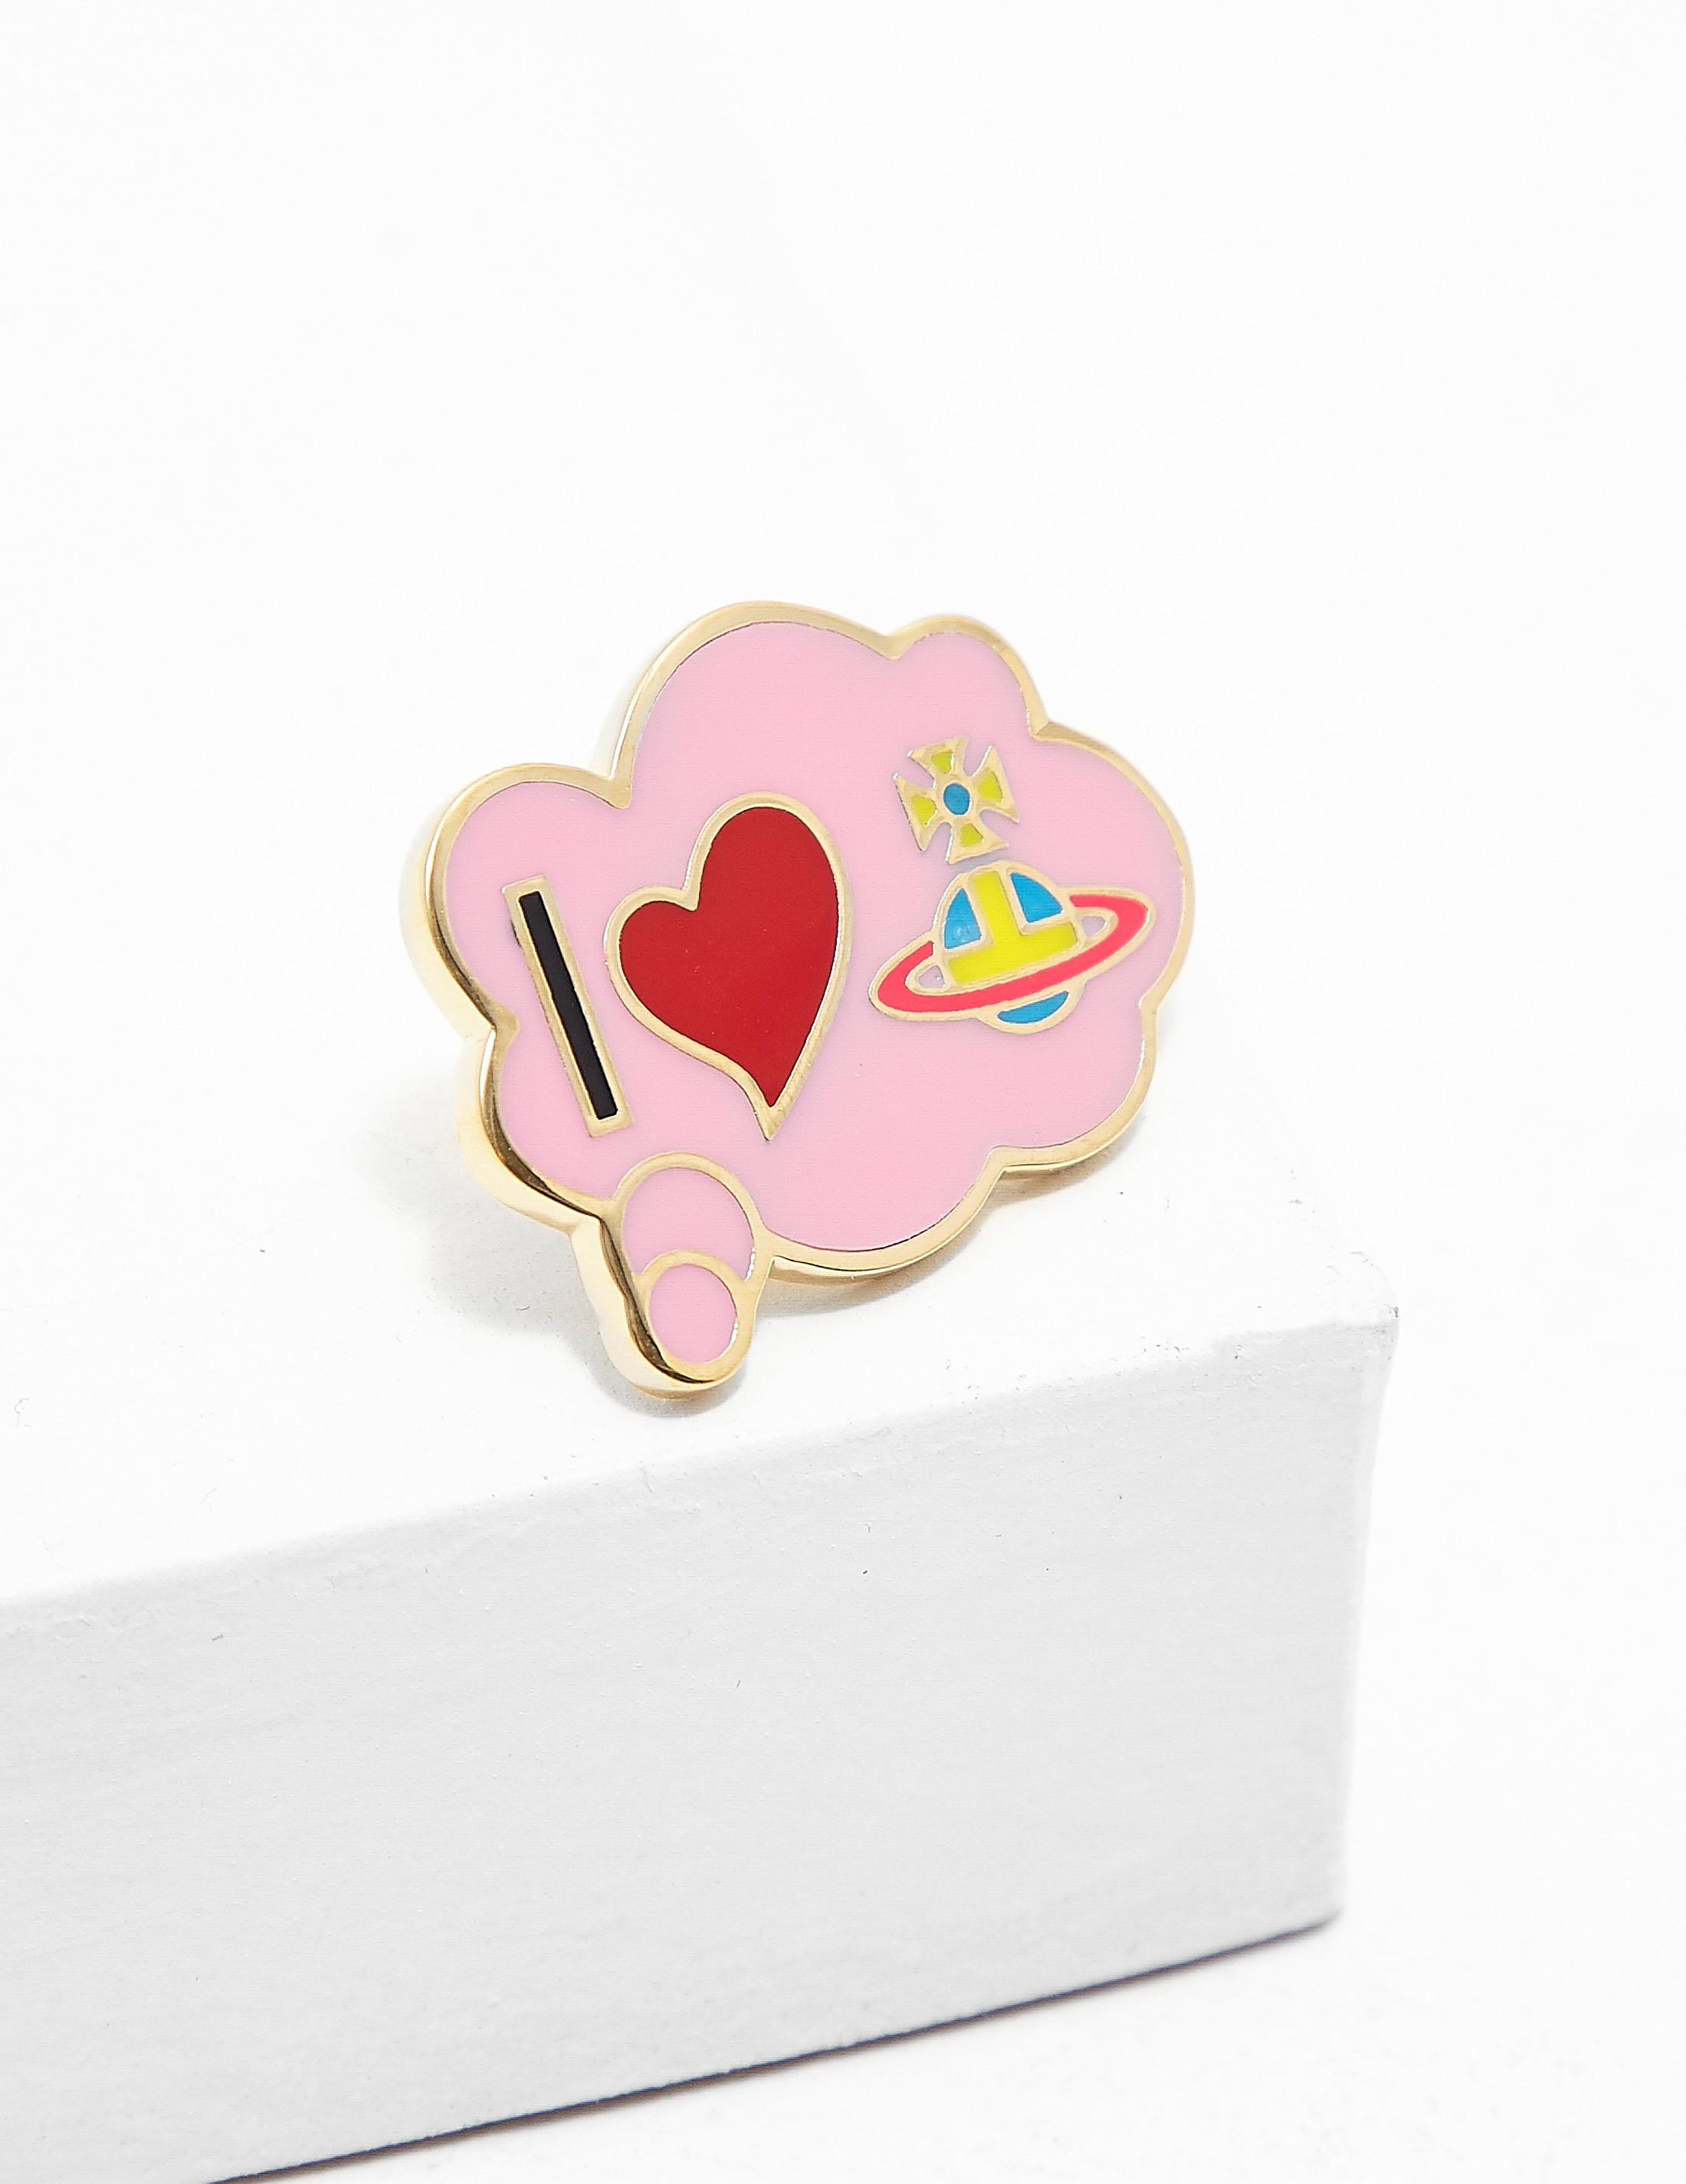 Vivienne Westwood Heart Pin